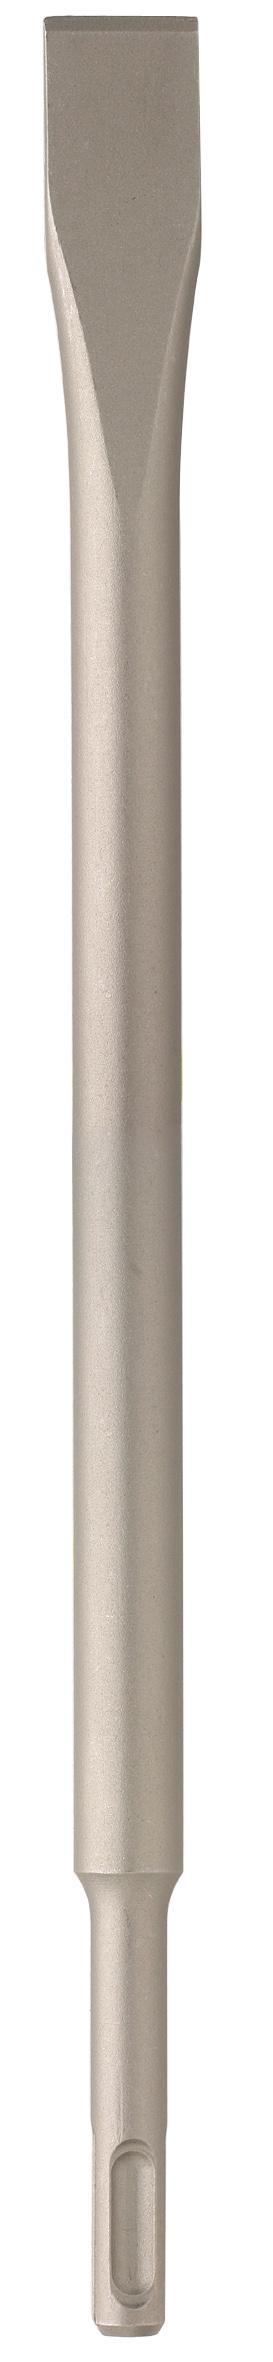 Spademeisel Diager SDS-plus 240 mm